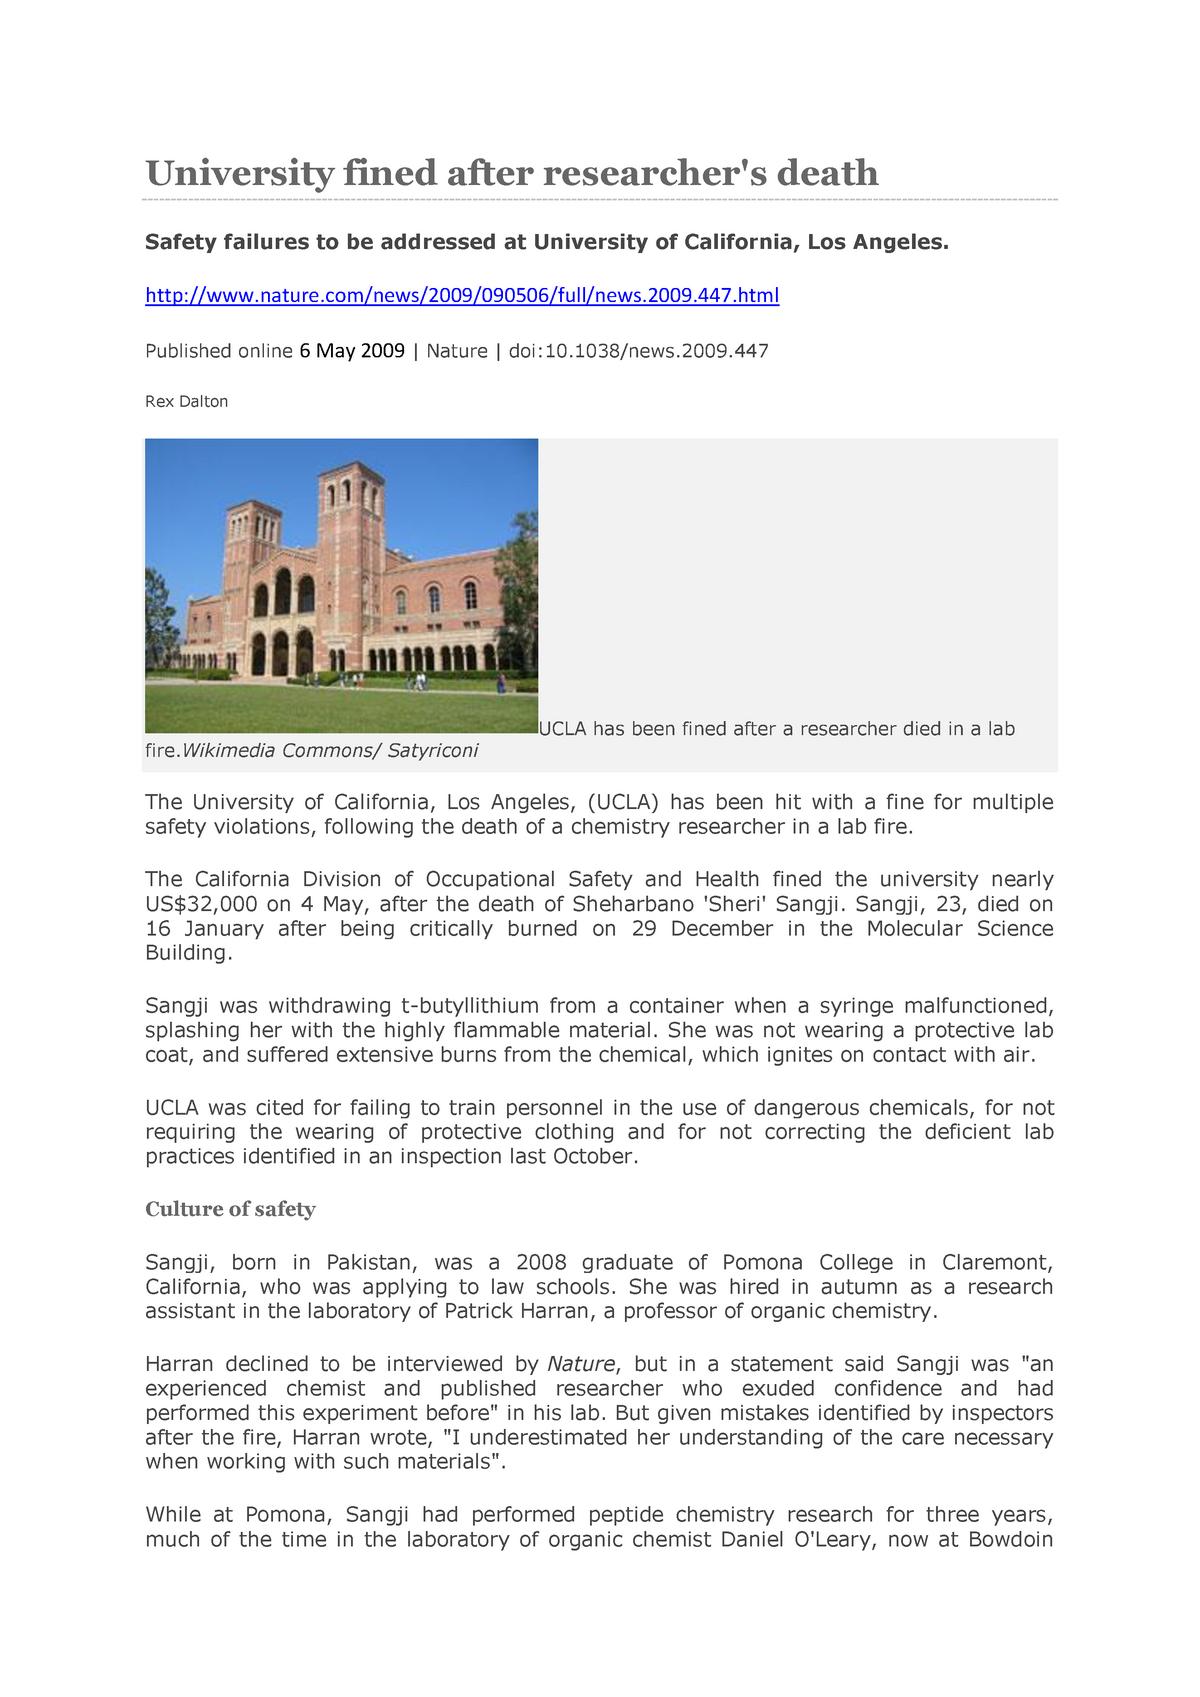 Lecture notes, lecture 2 supplement notes - PUBH1369